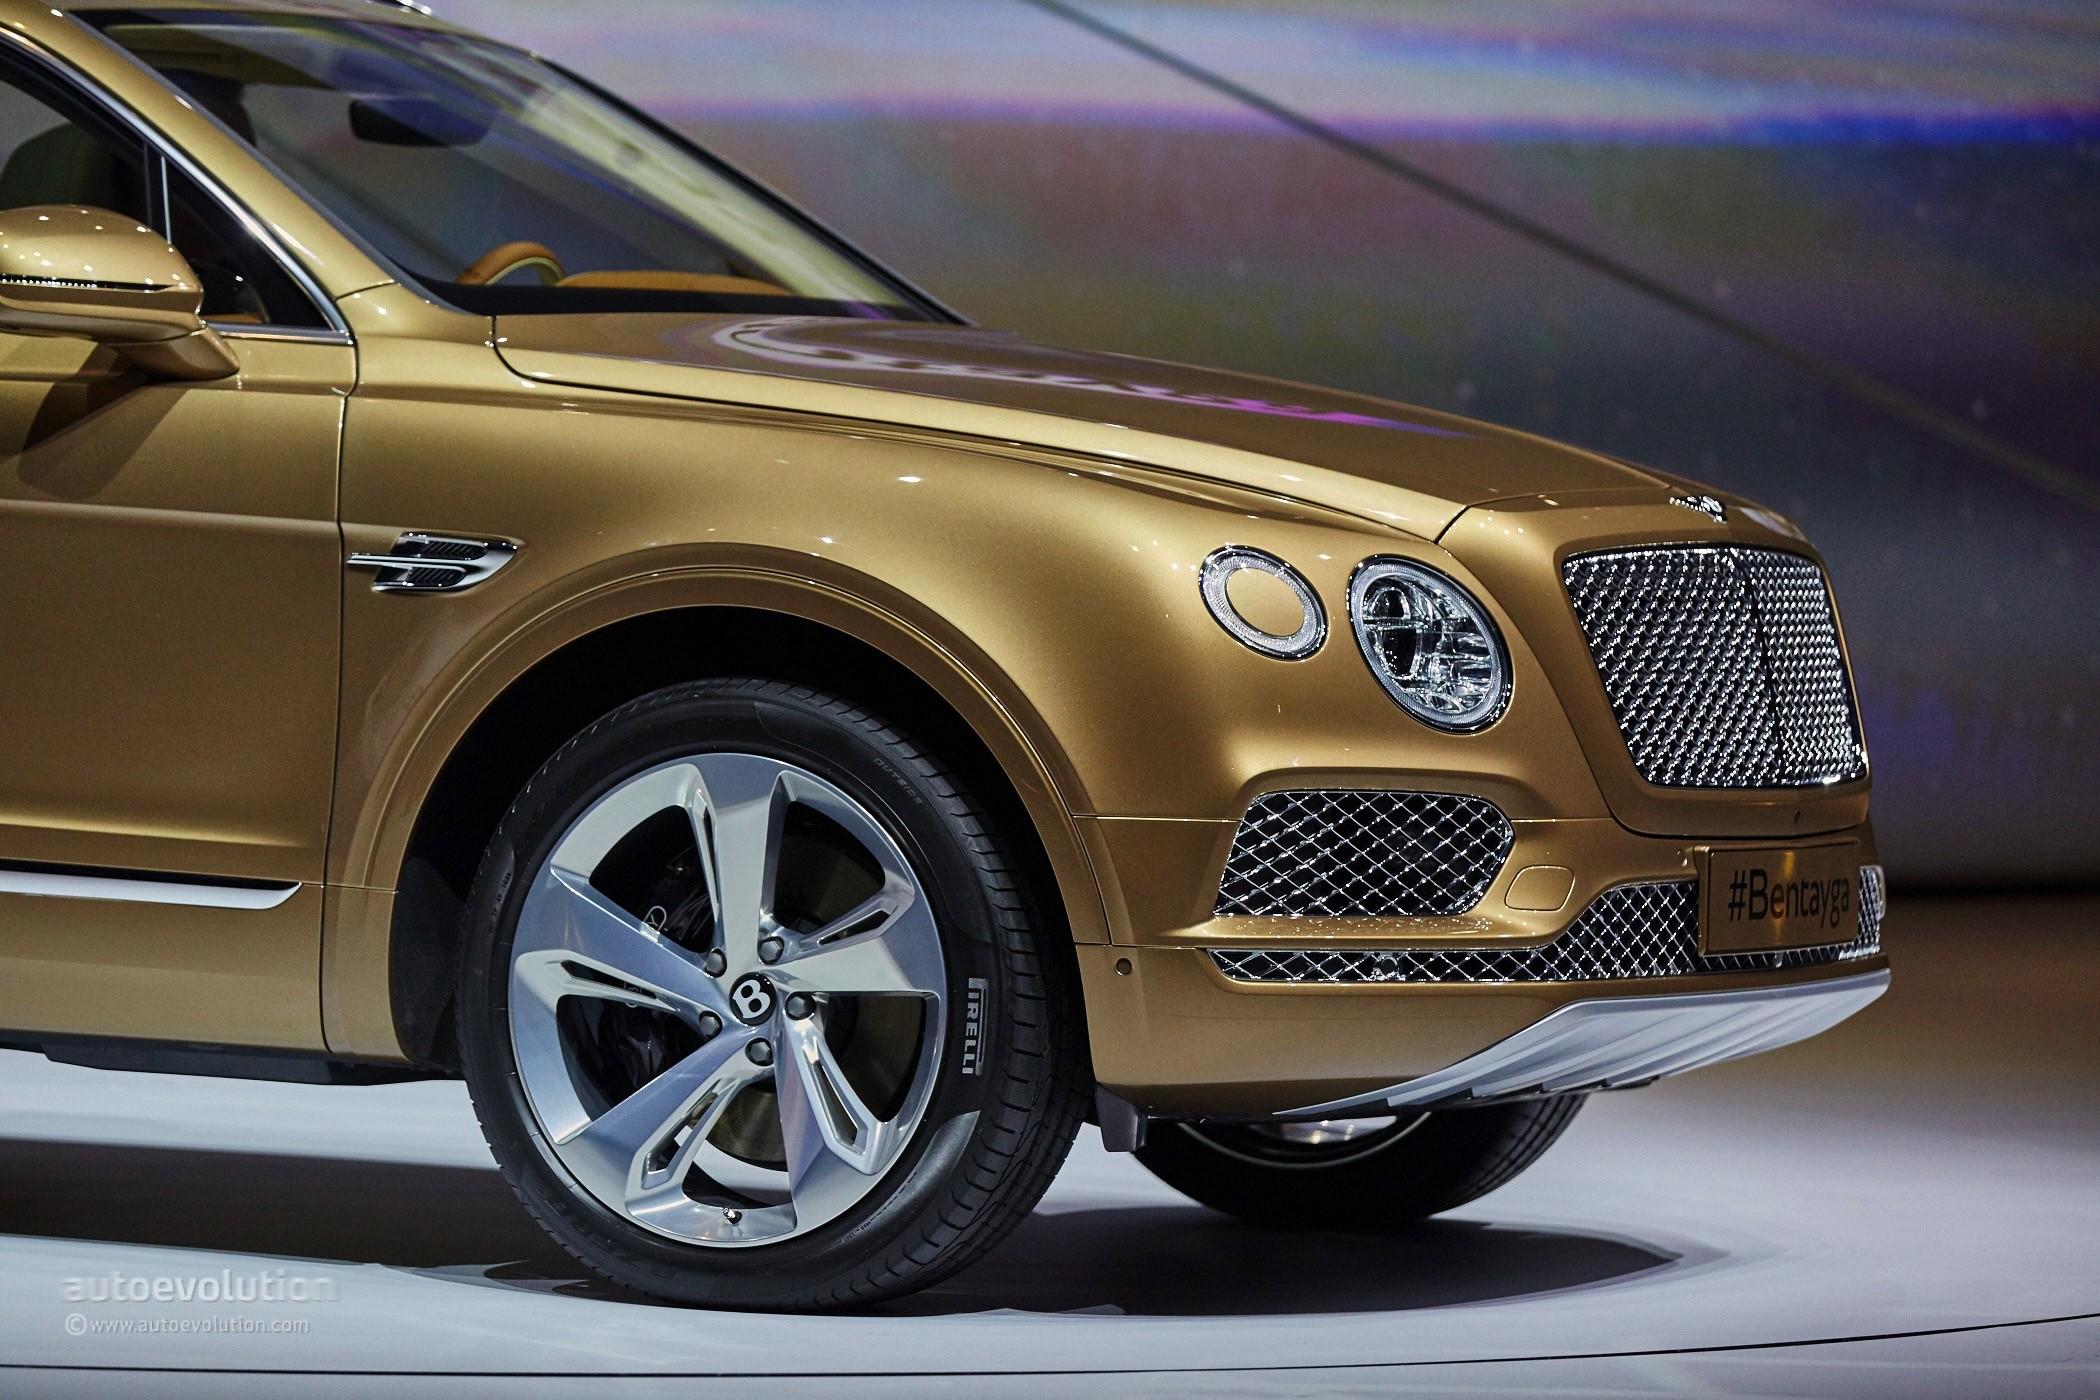 2016 Bentley Bentayga Makes World Debut in Gold at Frankfurt ...